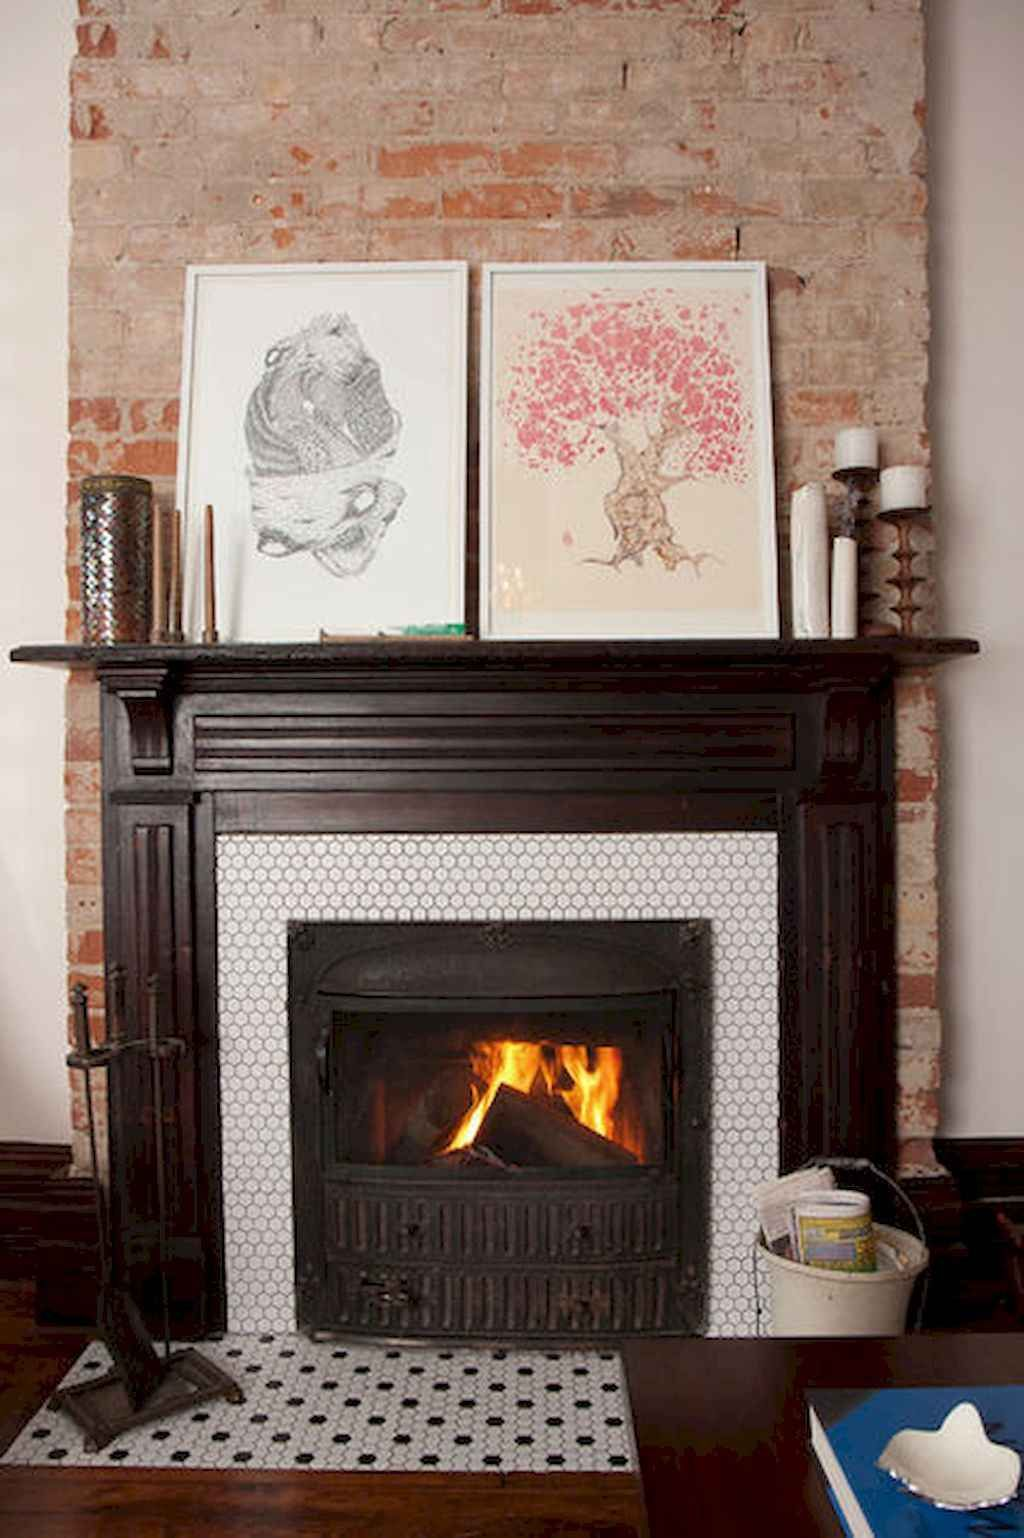 60 Vintage Fireplace Ideas 21 In 2020 Vintage Fireplace